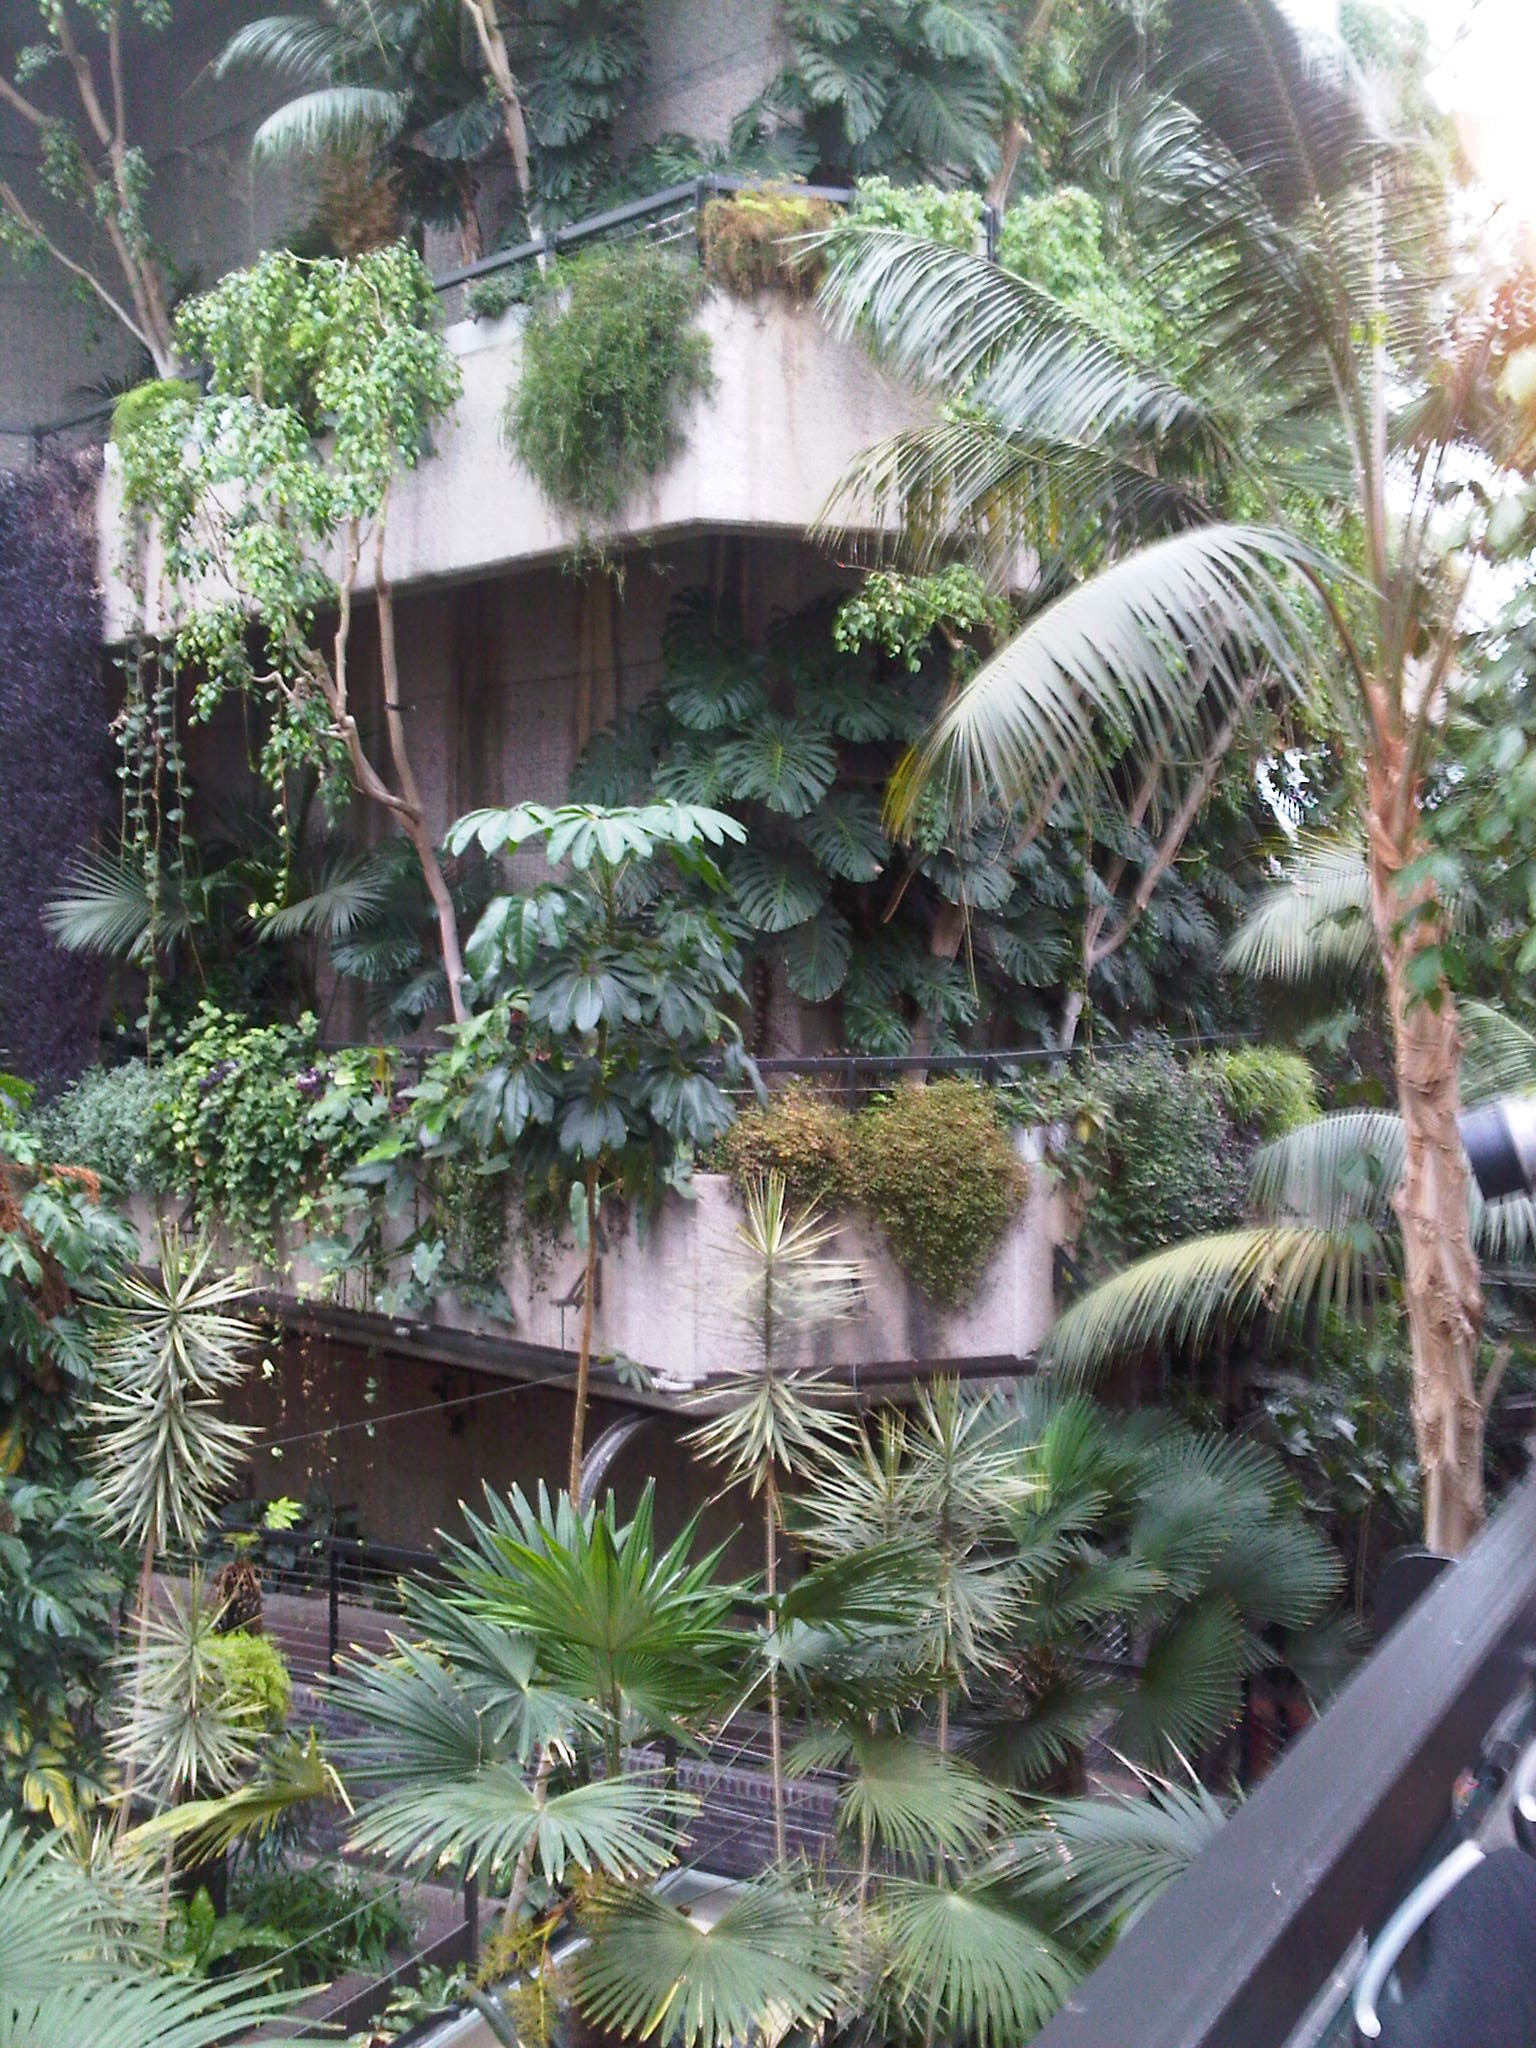 London Iphone X Wallpaper Hanging Gardens Of Babylon Wallpaper 47 Images